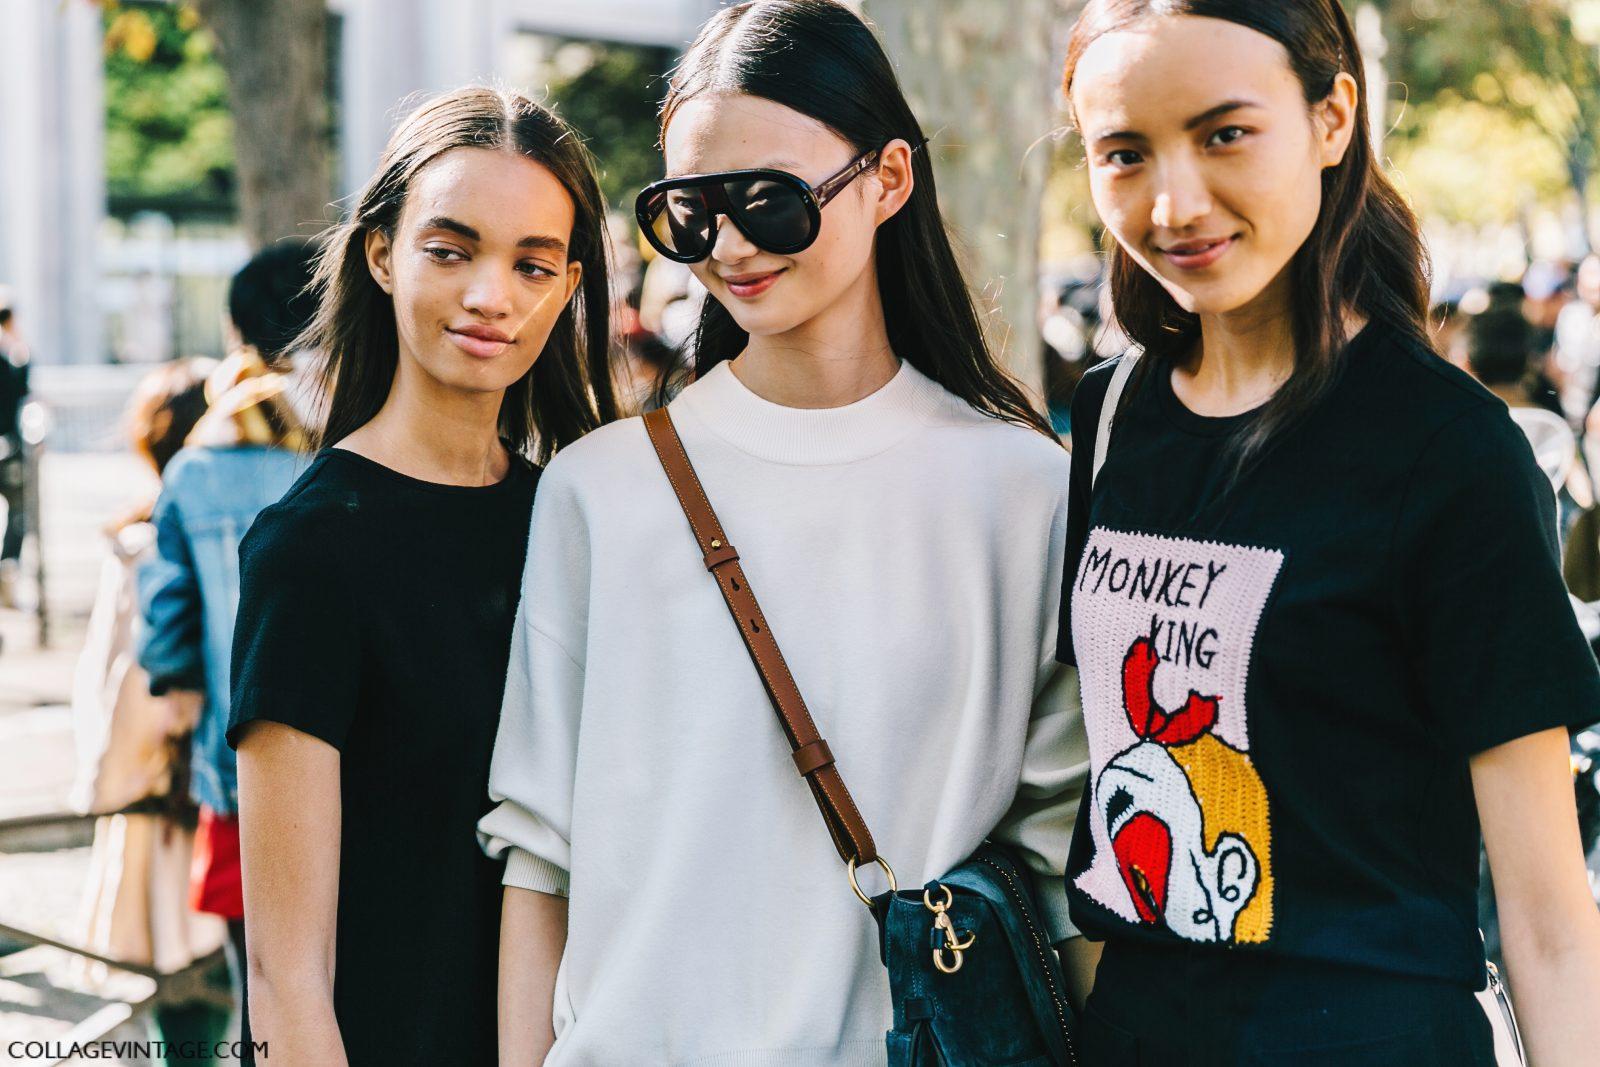 pfw-paris_fashion_week_ss17-street_style-outfit-collage_vintage-louis_vuitton-miu_miu-6